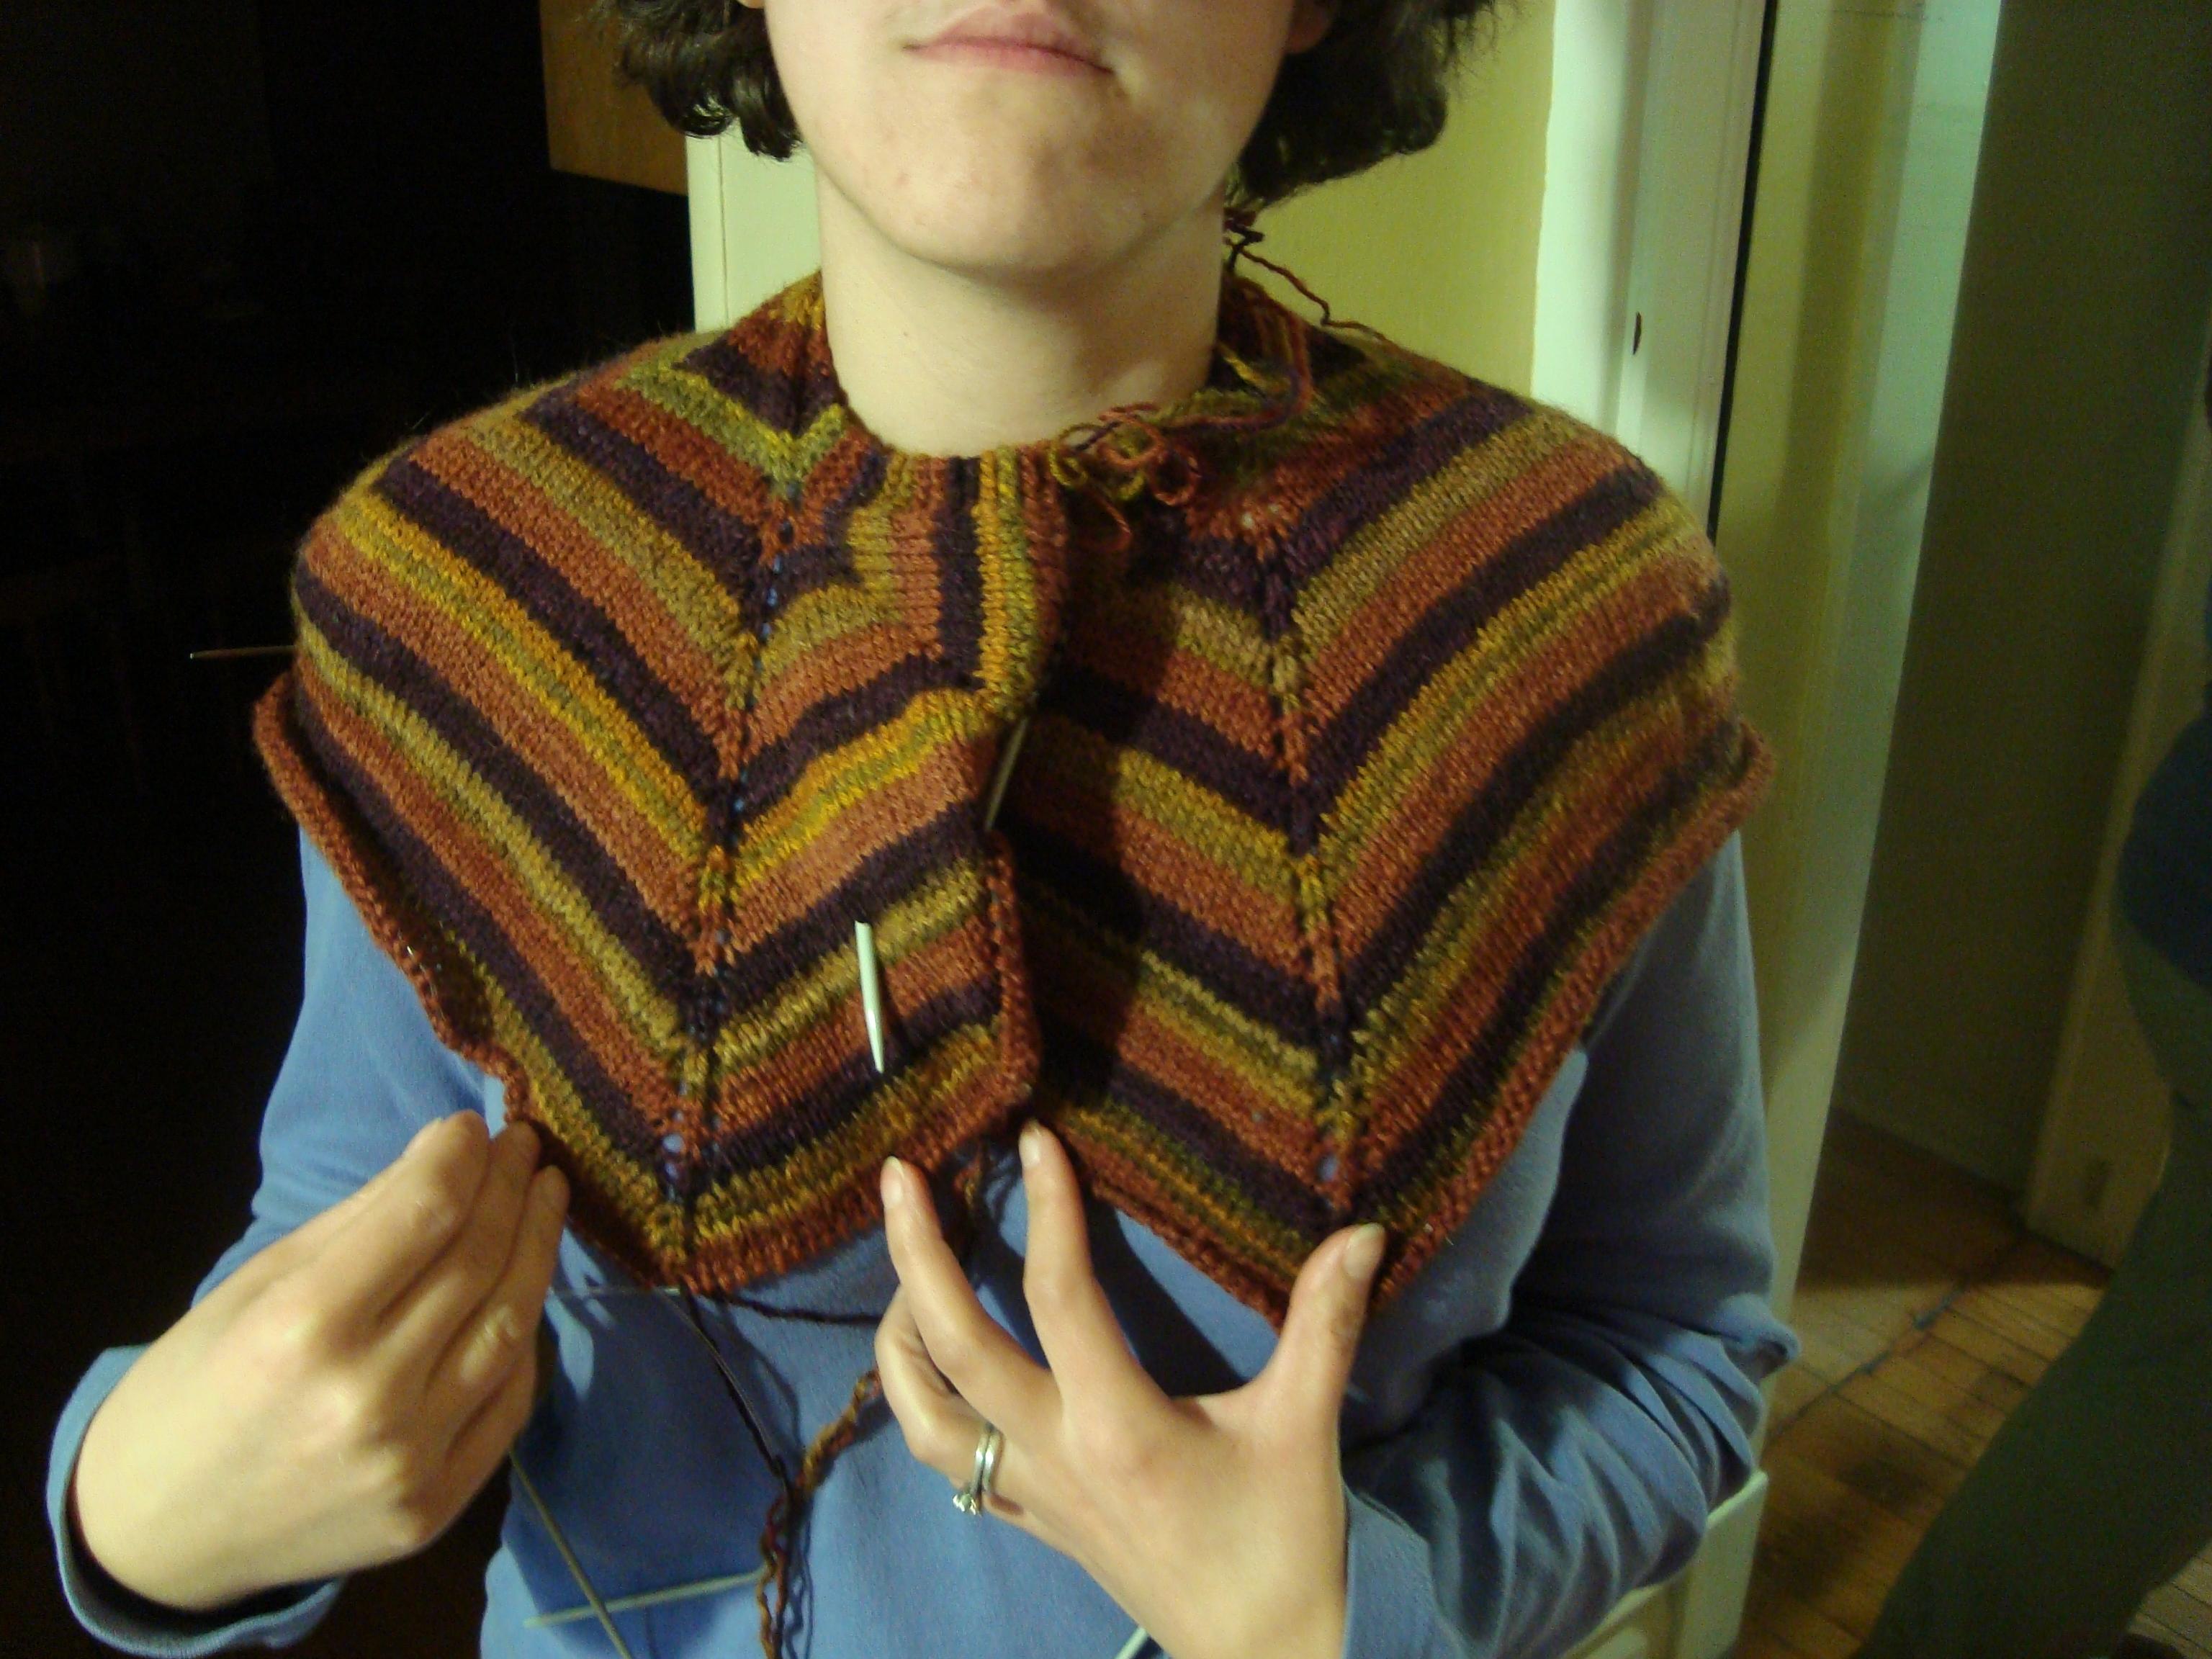 More Knitting Wheel Fashions : Entries tagged with u201cspinningu201d » desigknit